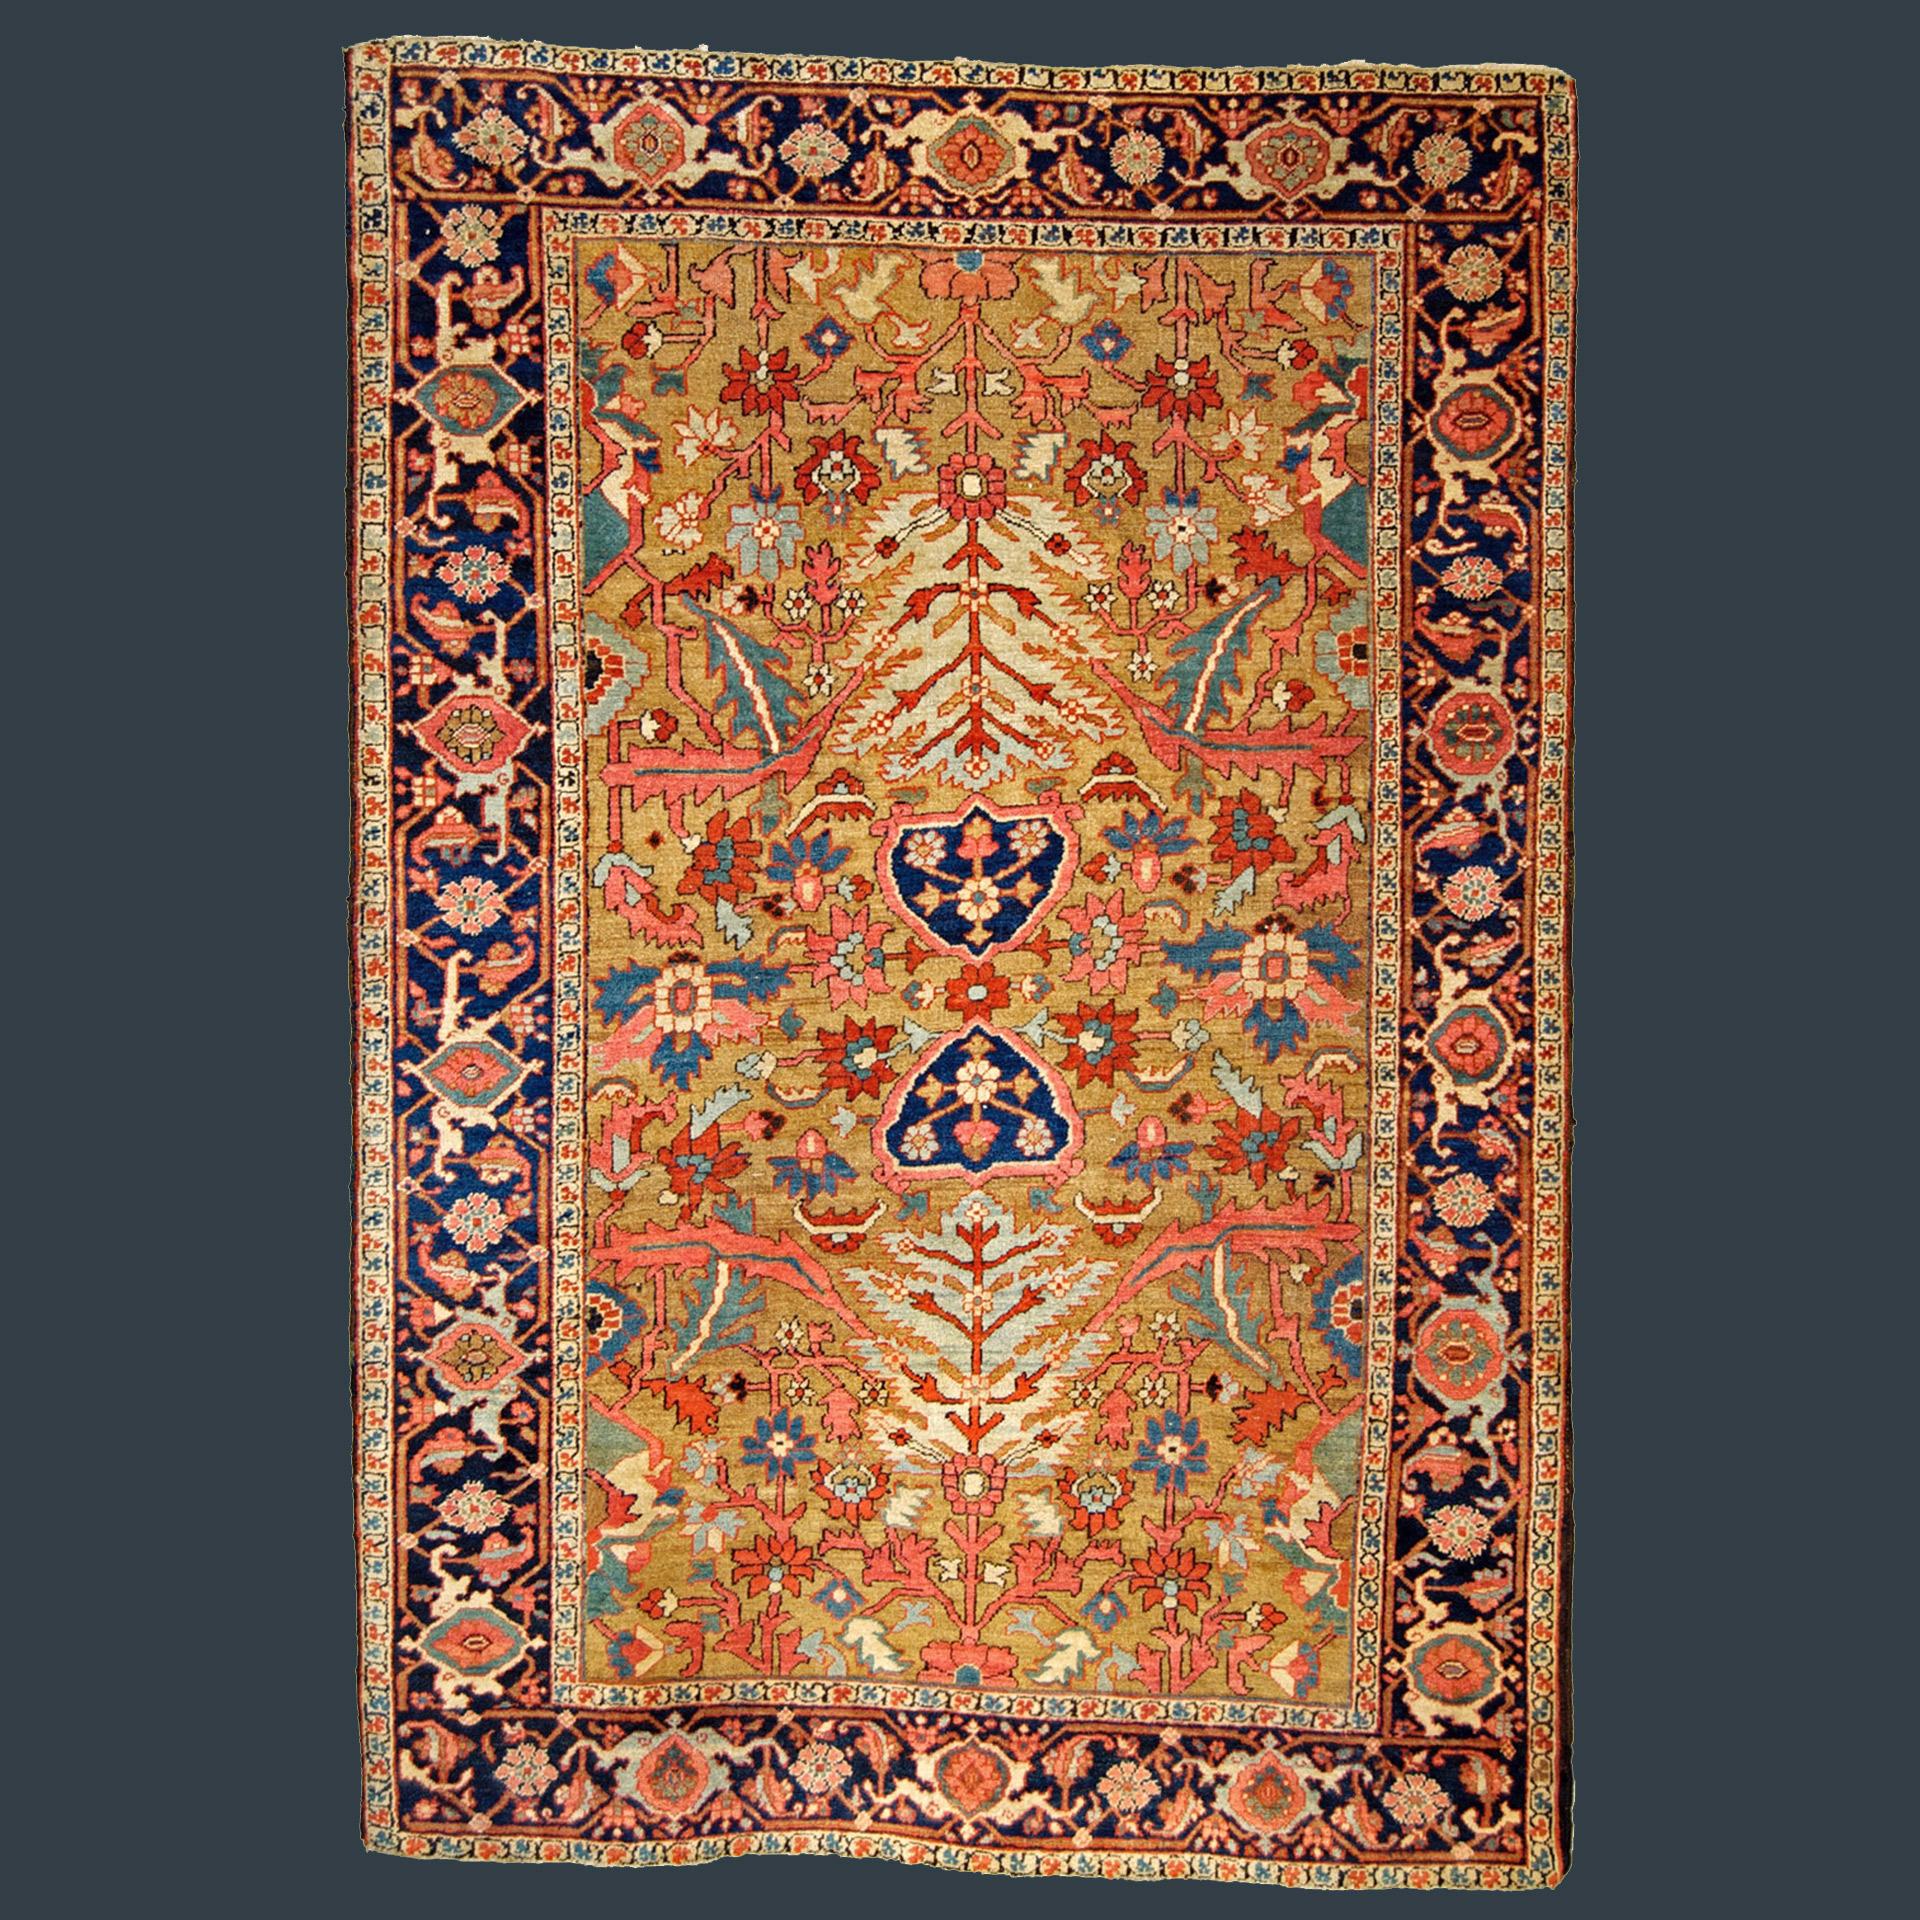 Antique Heriz Serapi rug with yellow-camel field